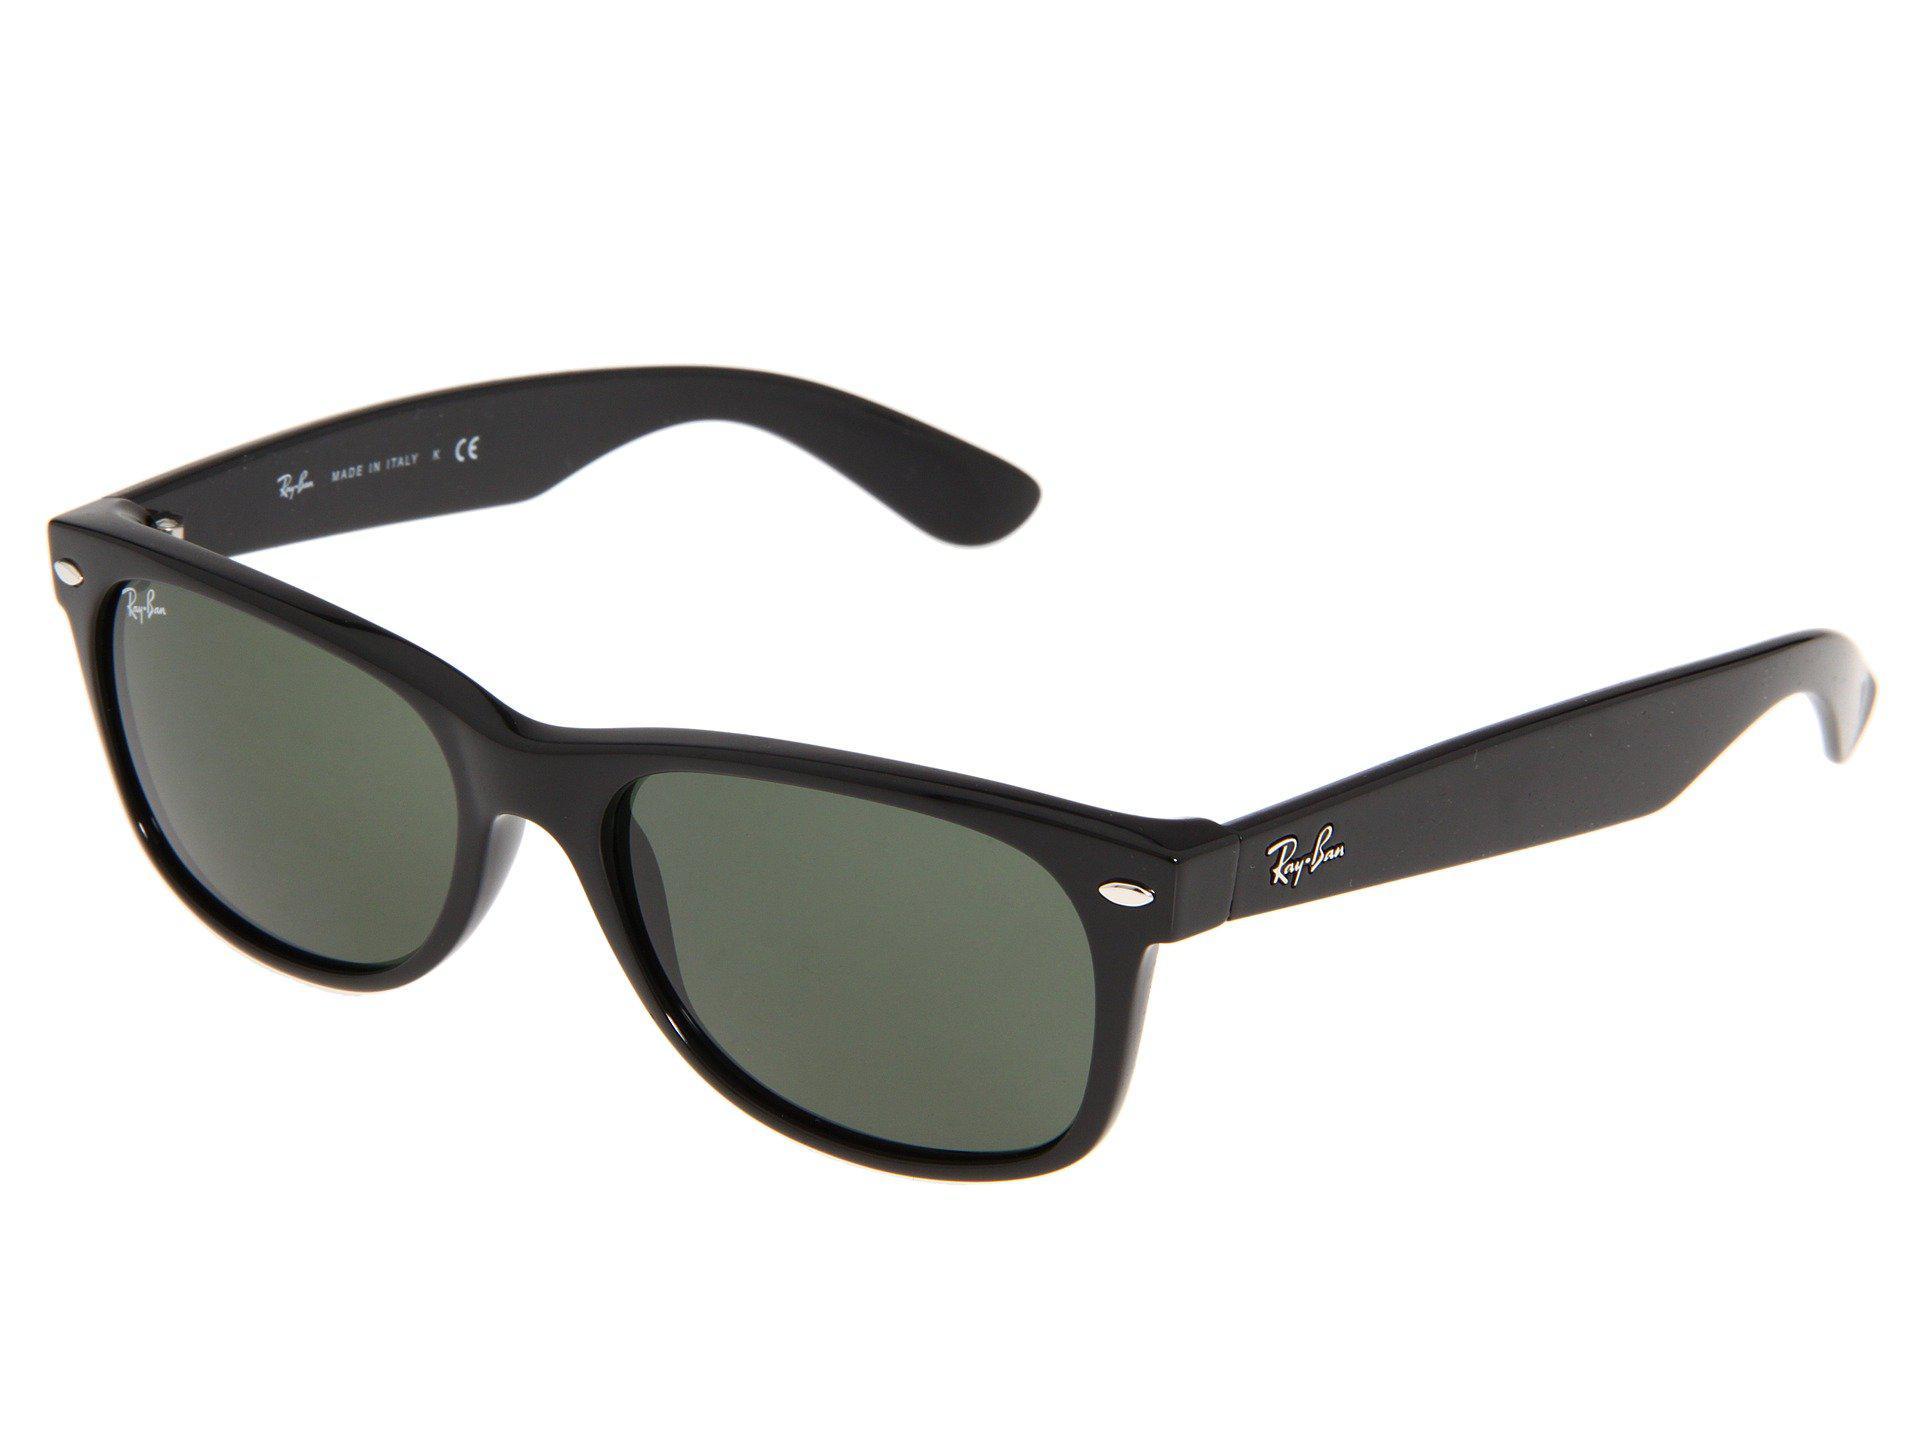 c9f9cfbb528 Ray-Ban. Women s Rb2132 New Wayfarer 55mm (black g-15 Xlt Lens) Fashion  Sunglasses